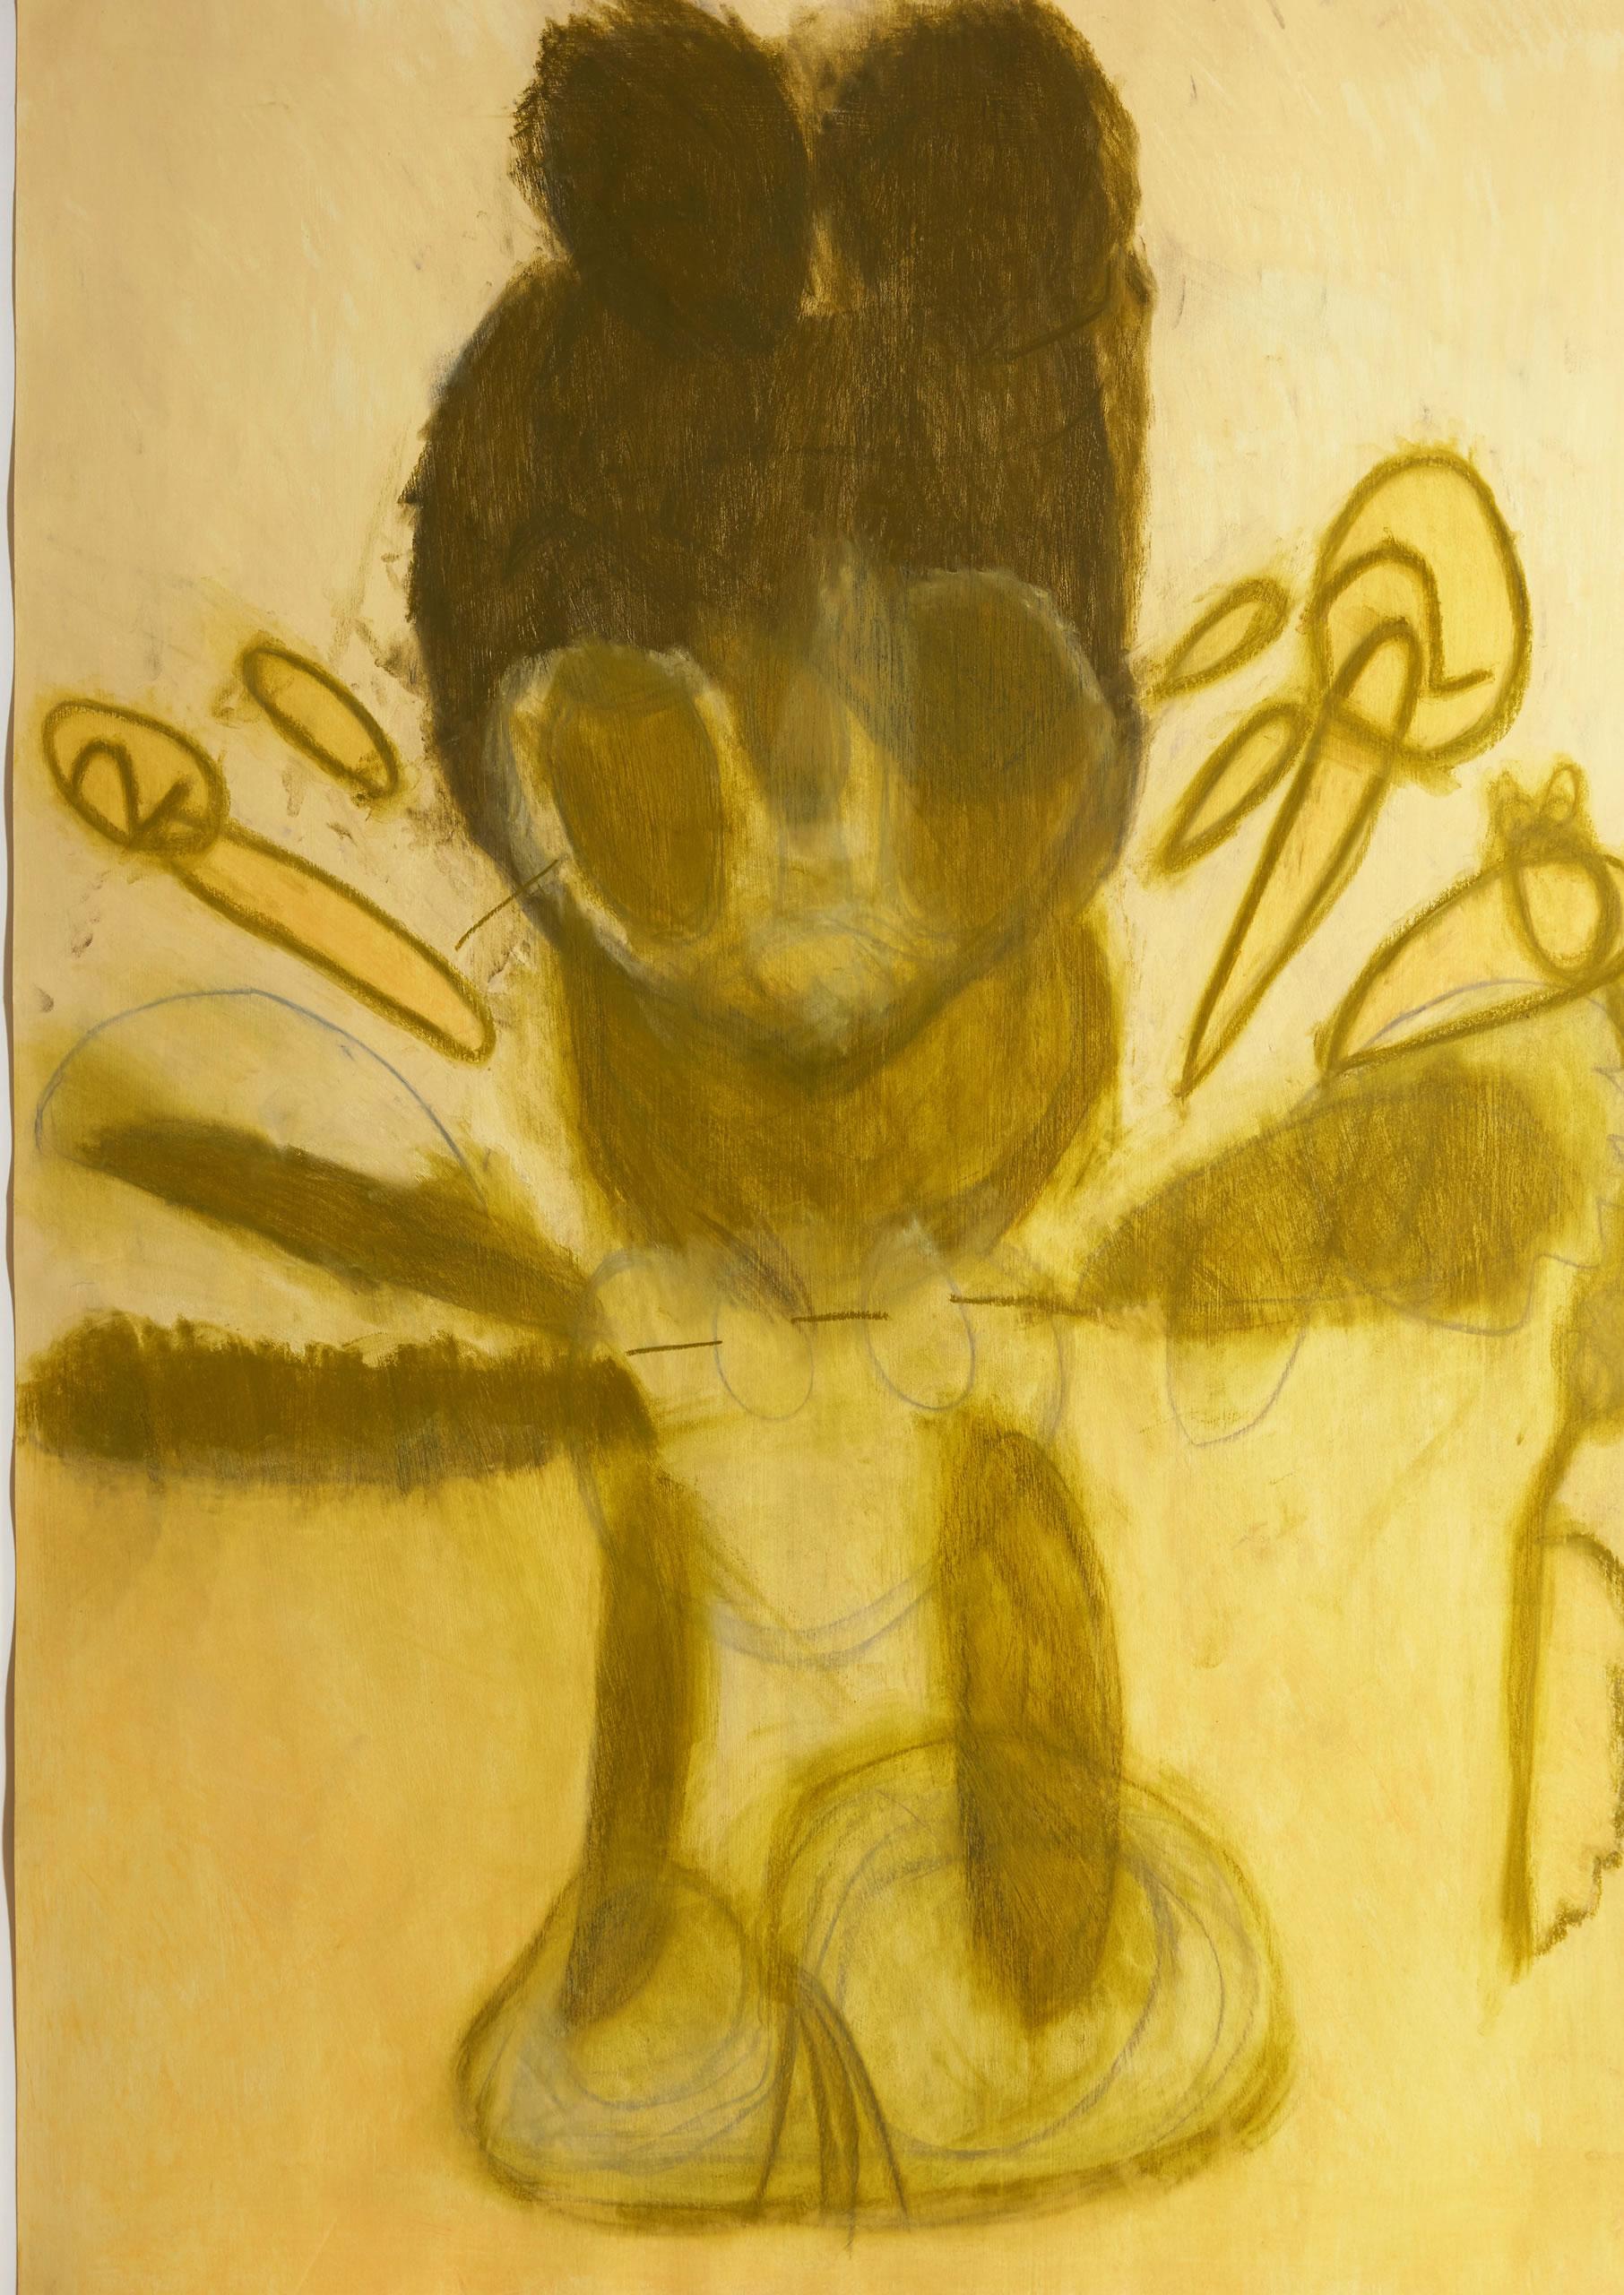 Sylvia Manfreda | Micky Mouse | 2009 | Pastell auf Papier | 100 x 70 cm | Foto Johannes Puch | Galerie3